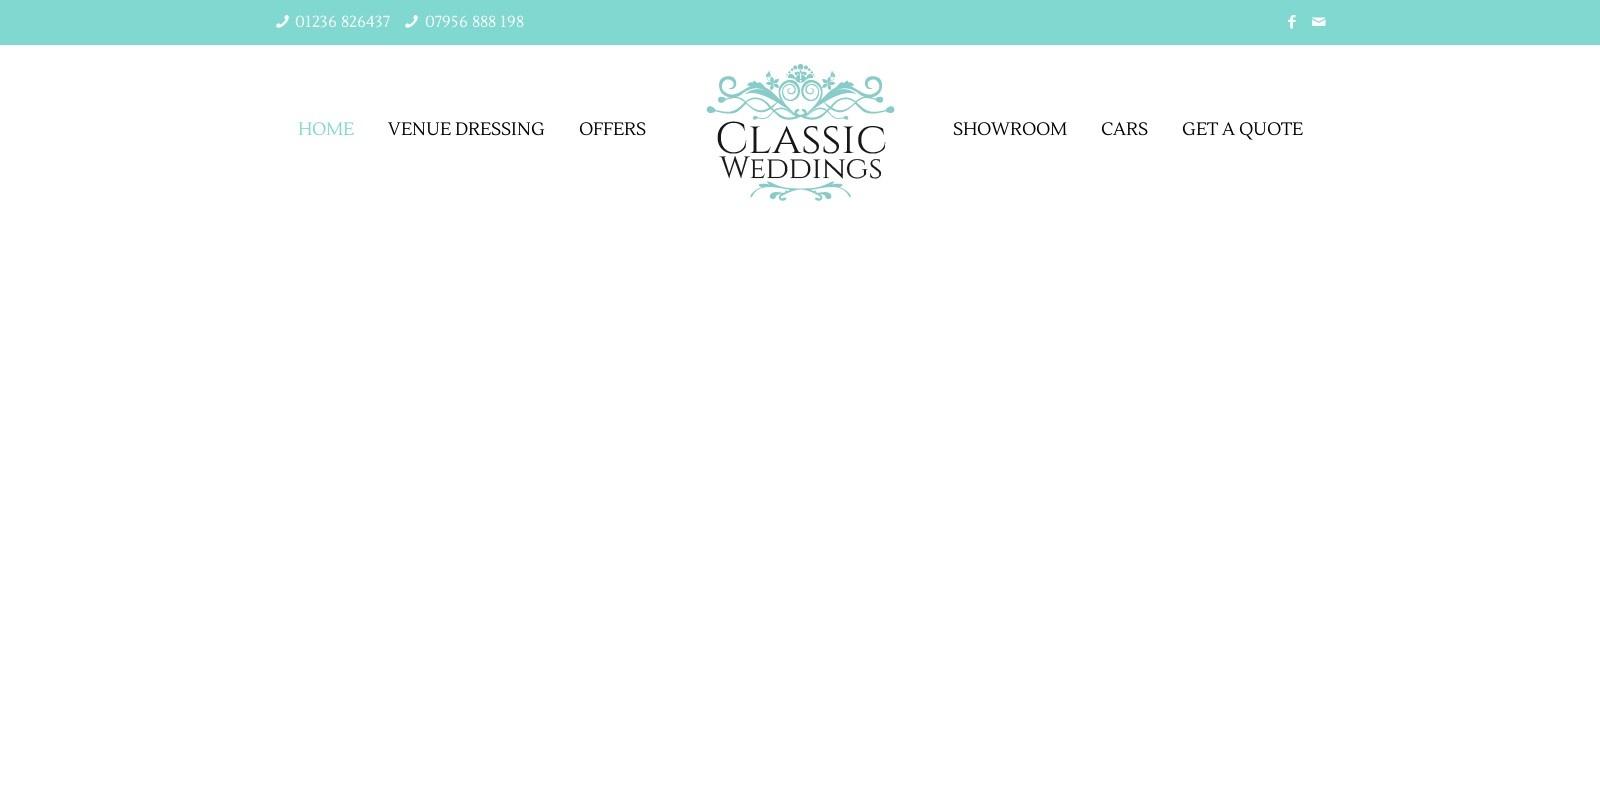 Preview of https://www.classicweddingcarsglasgow.co.uk/